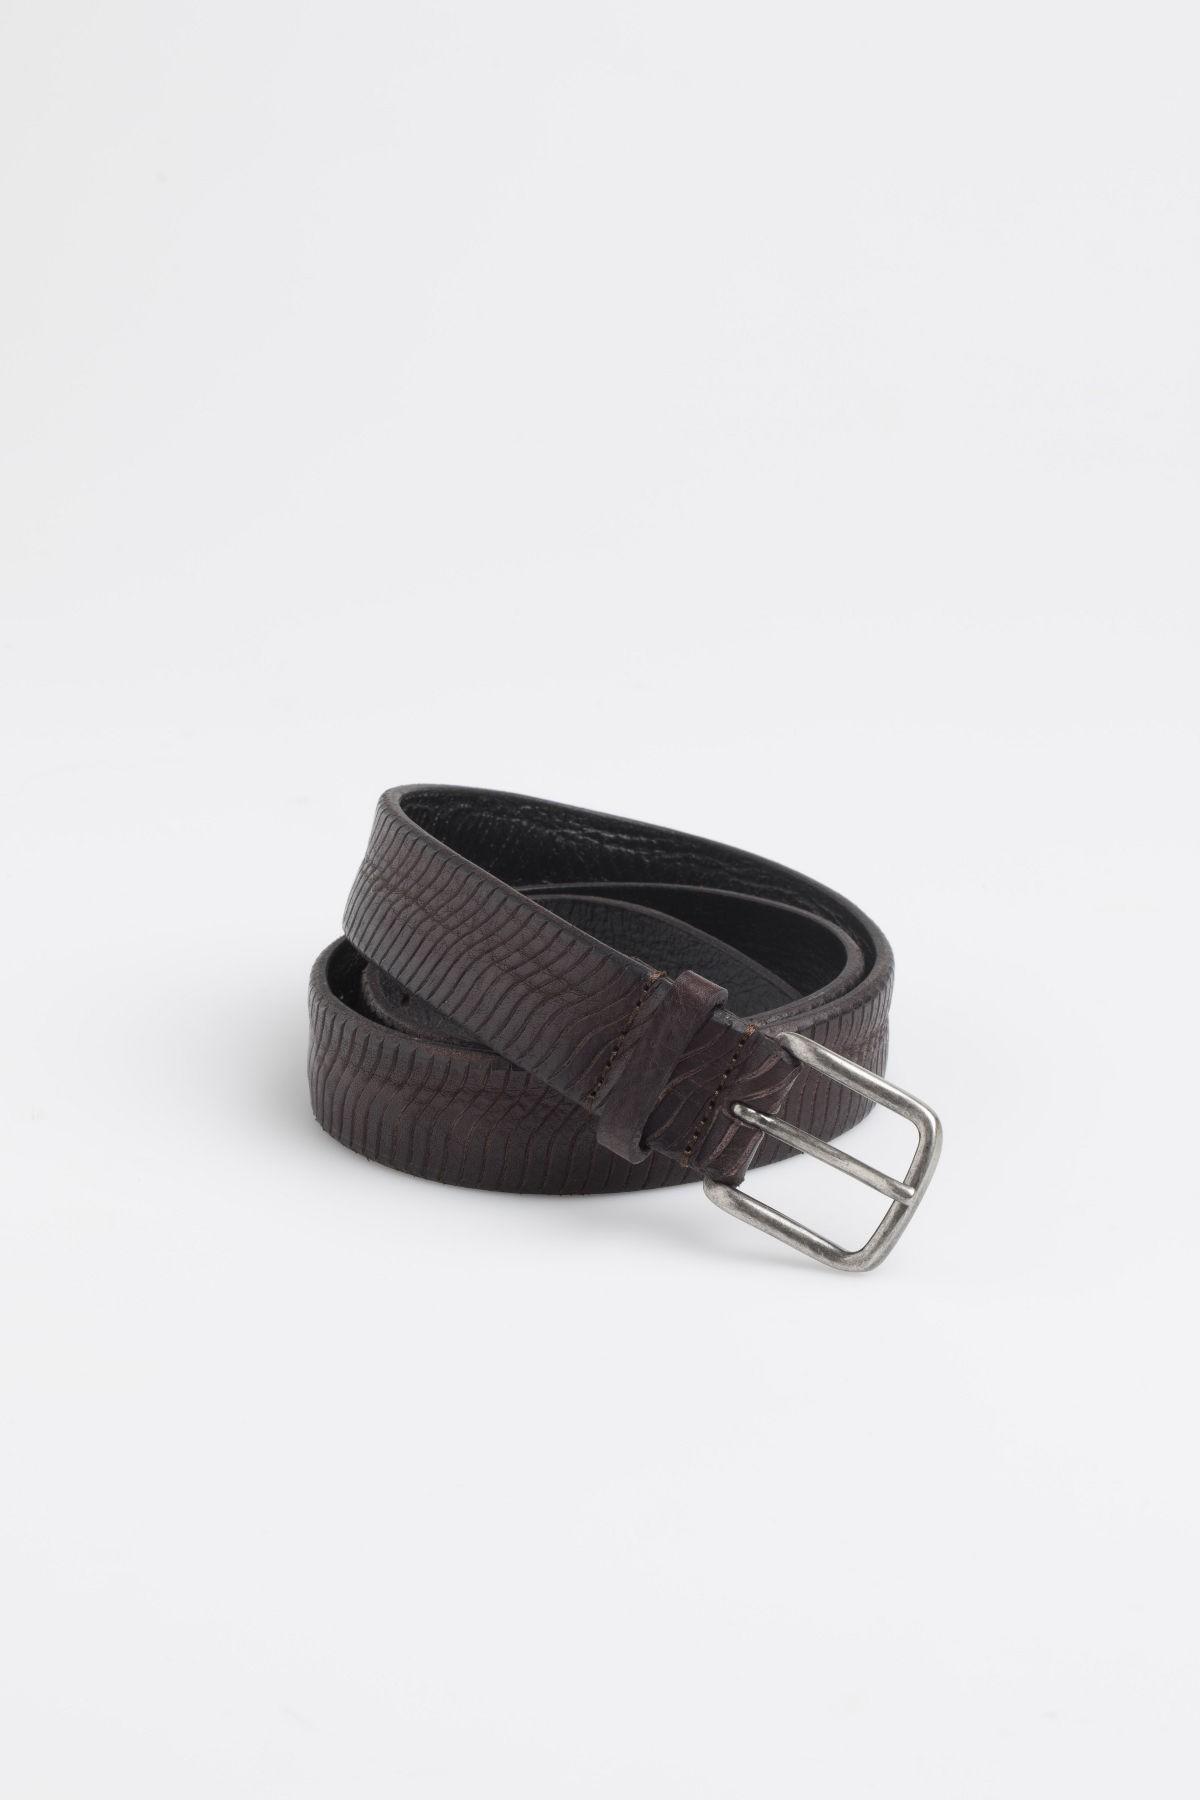 Belt RIONE FONTANA F/W 17-18